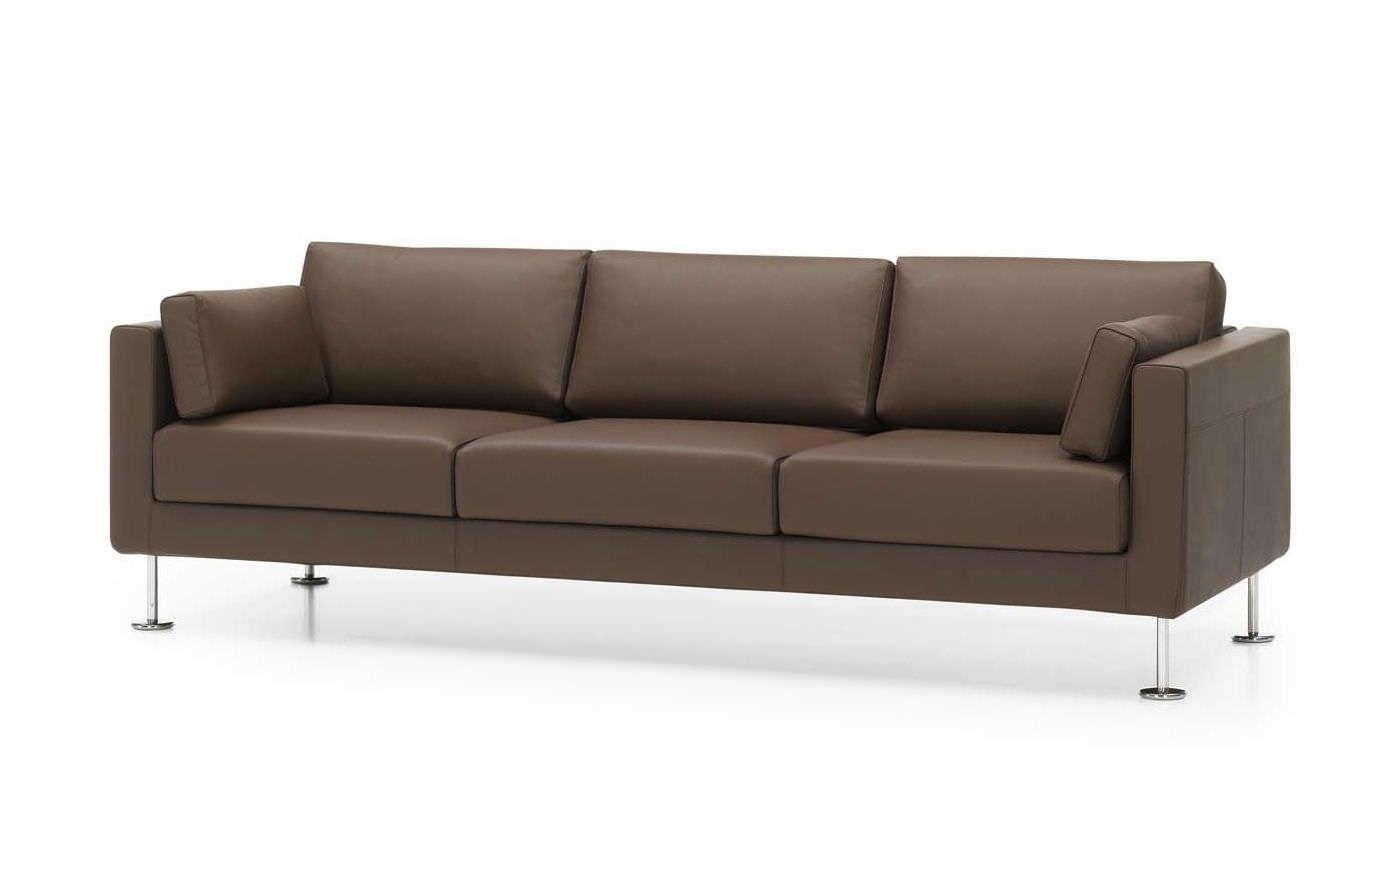 Vitra Sofa Google Search With Images Vitra Sofa Sofa Sofa